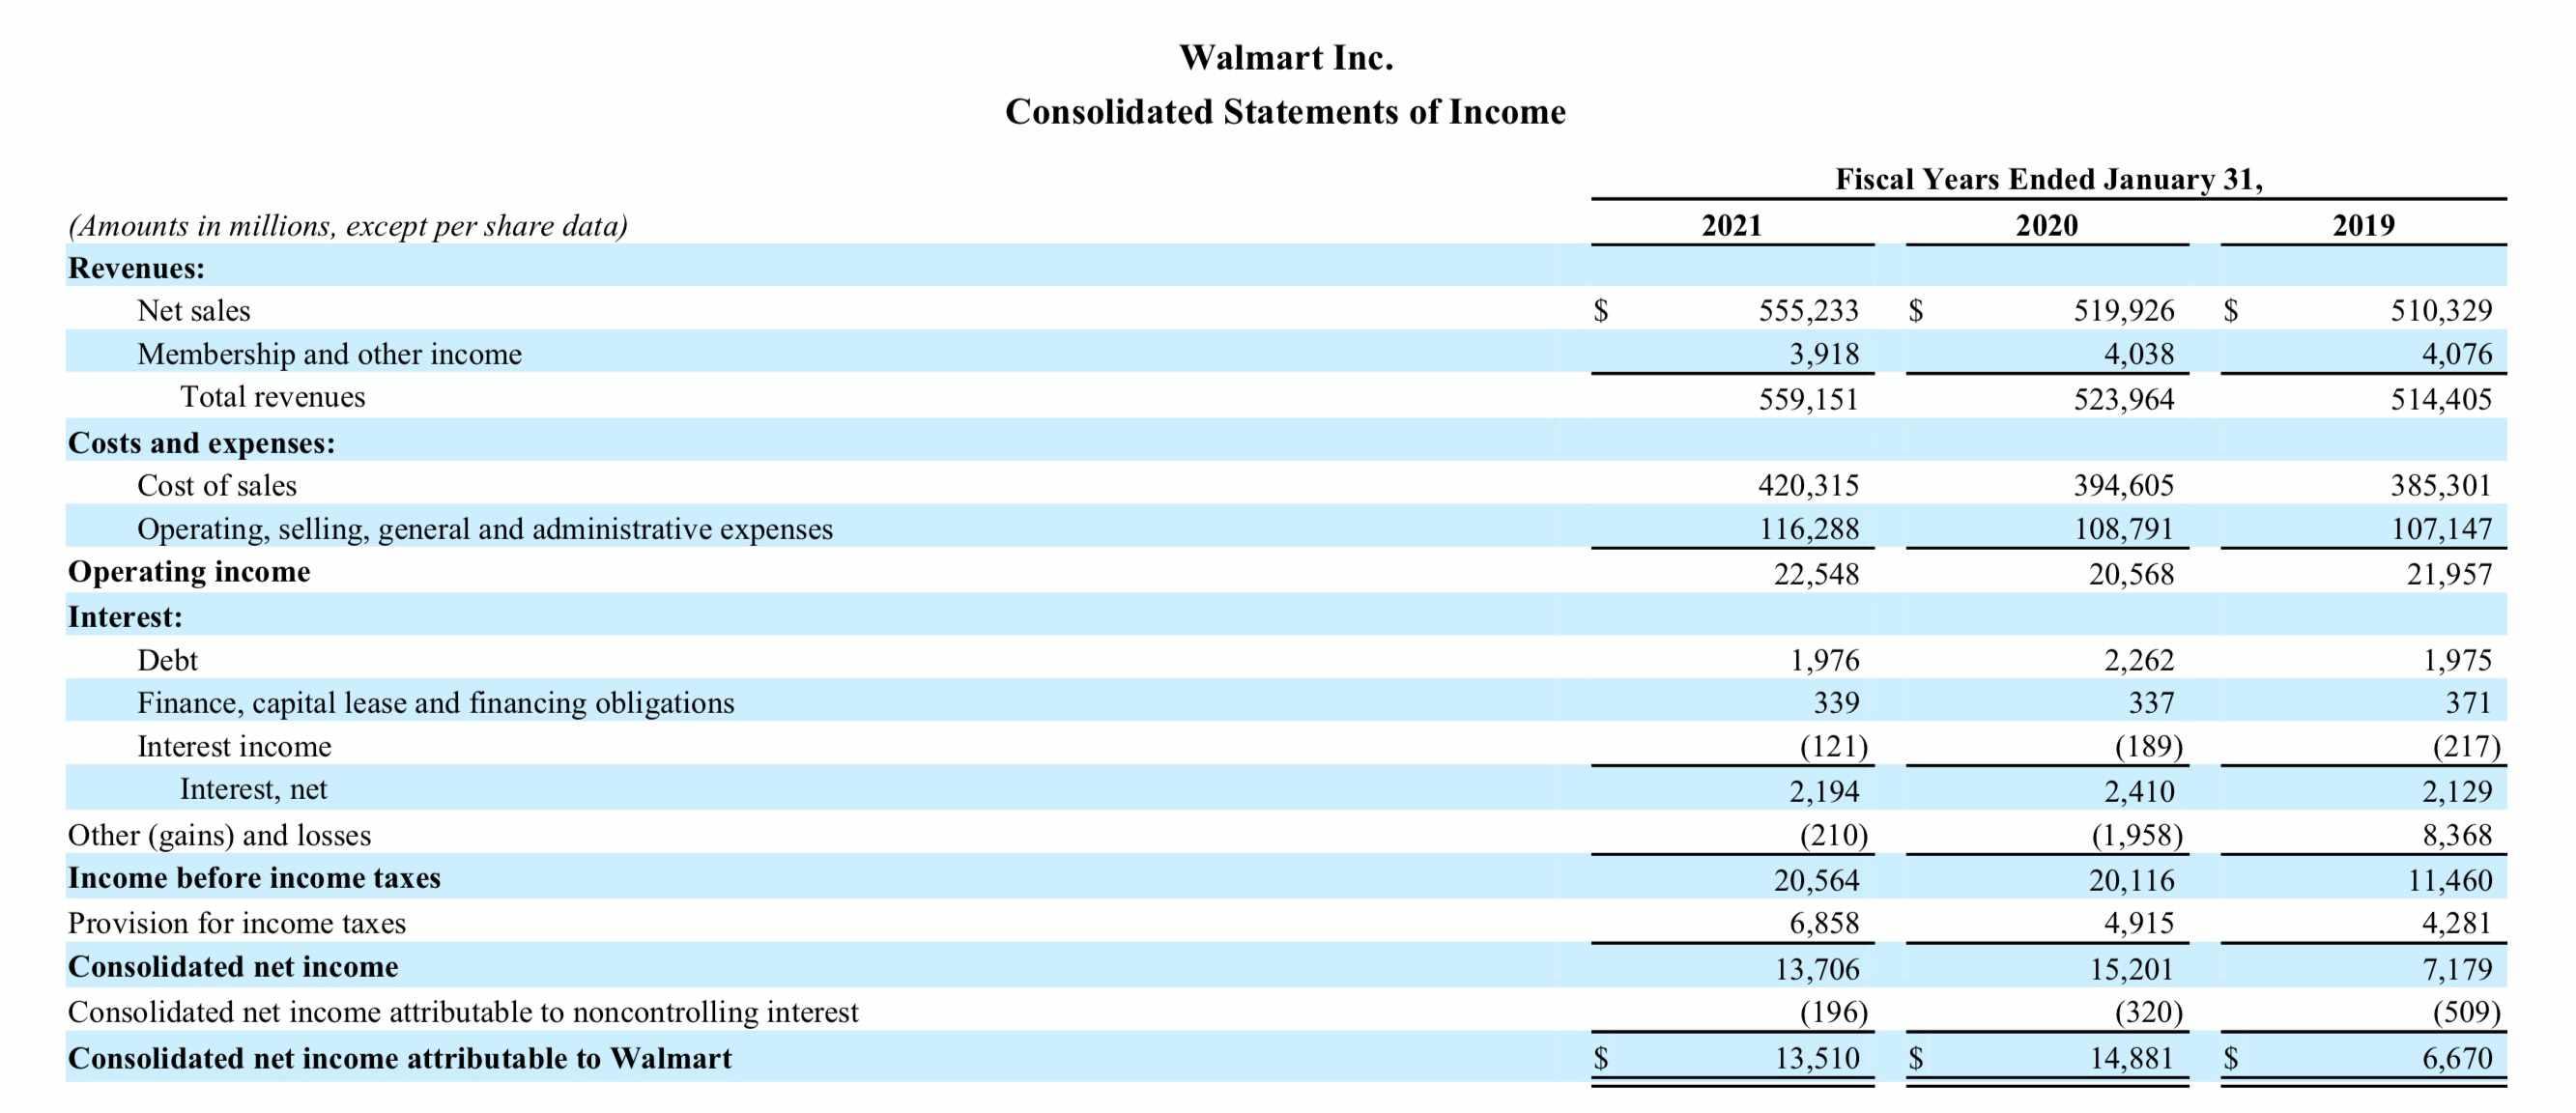 Walmart Income Statement 2020 10K